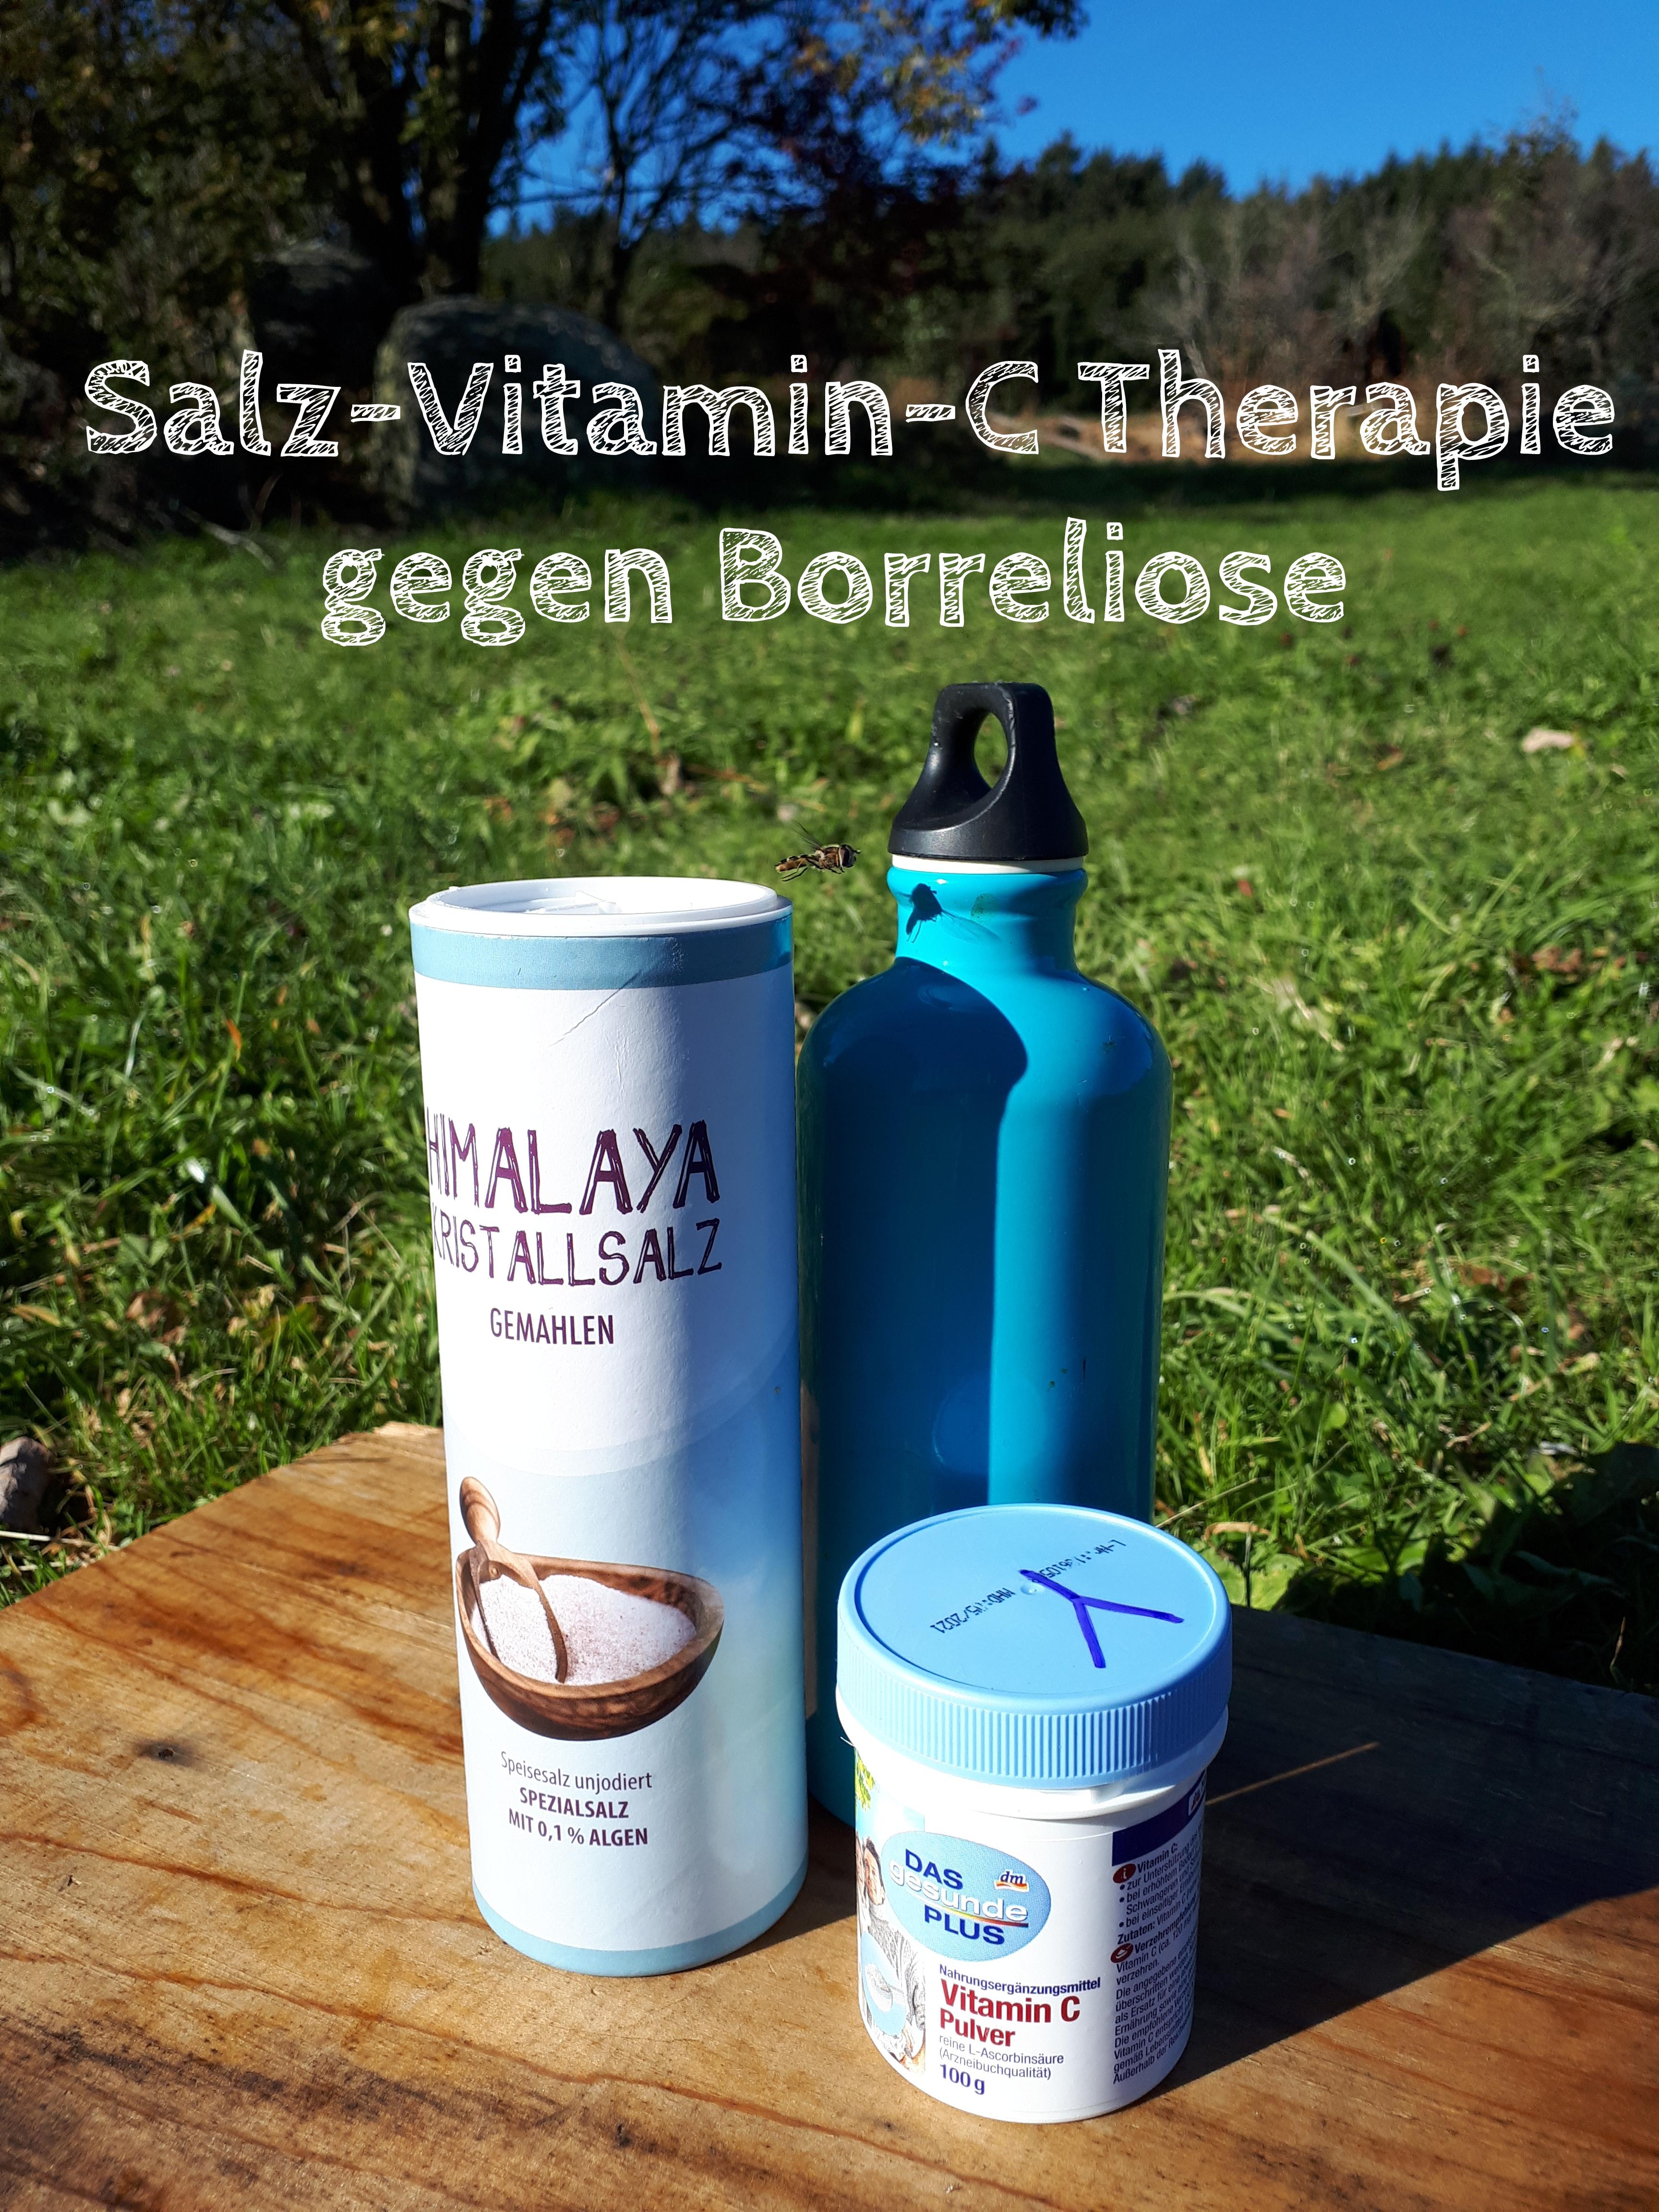 Salz-Vitamin-C Therapie gegen Borreliose